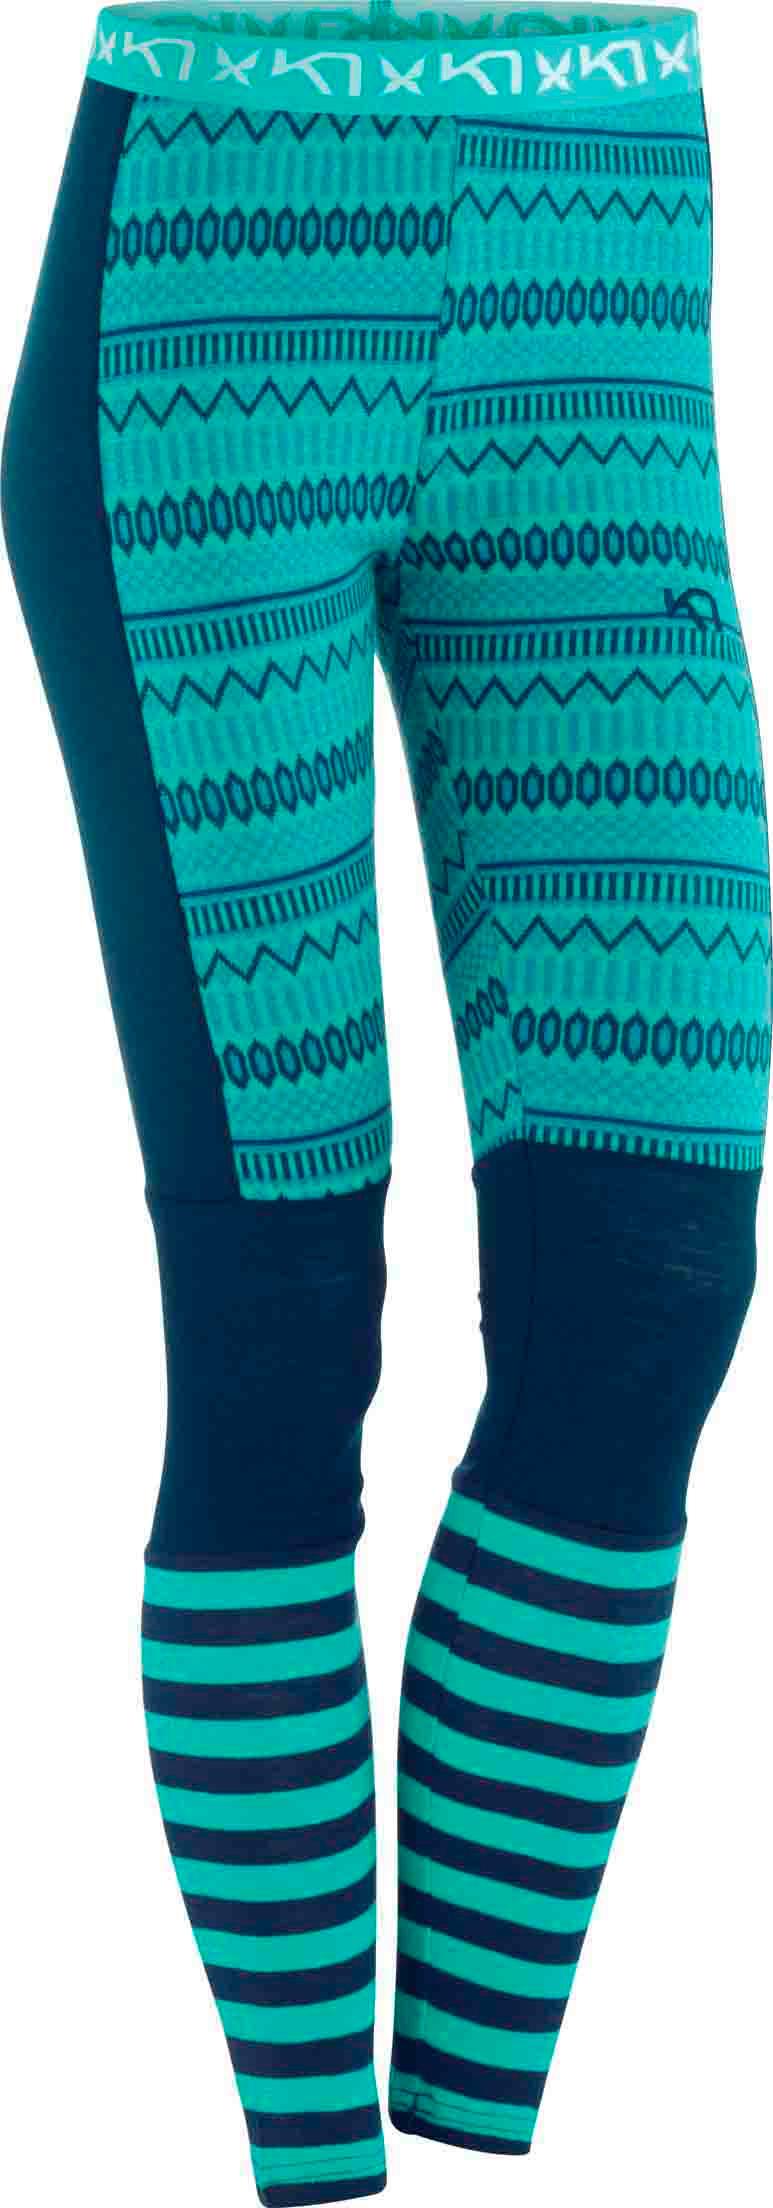 Åkle Tech Pants kerrastonhousut